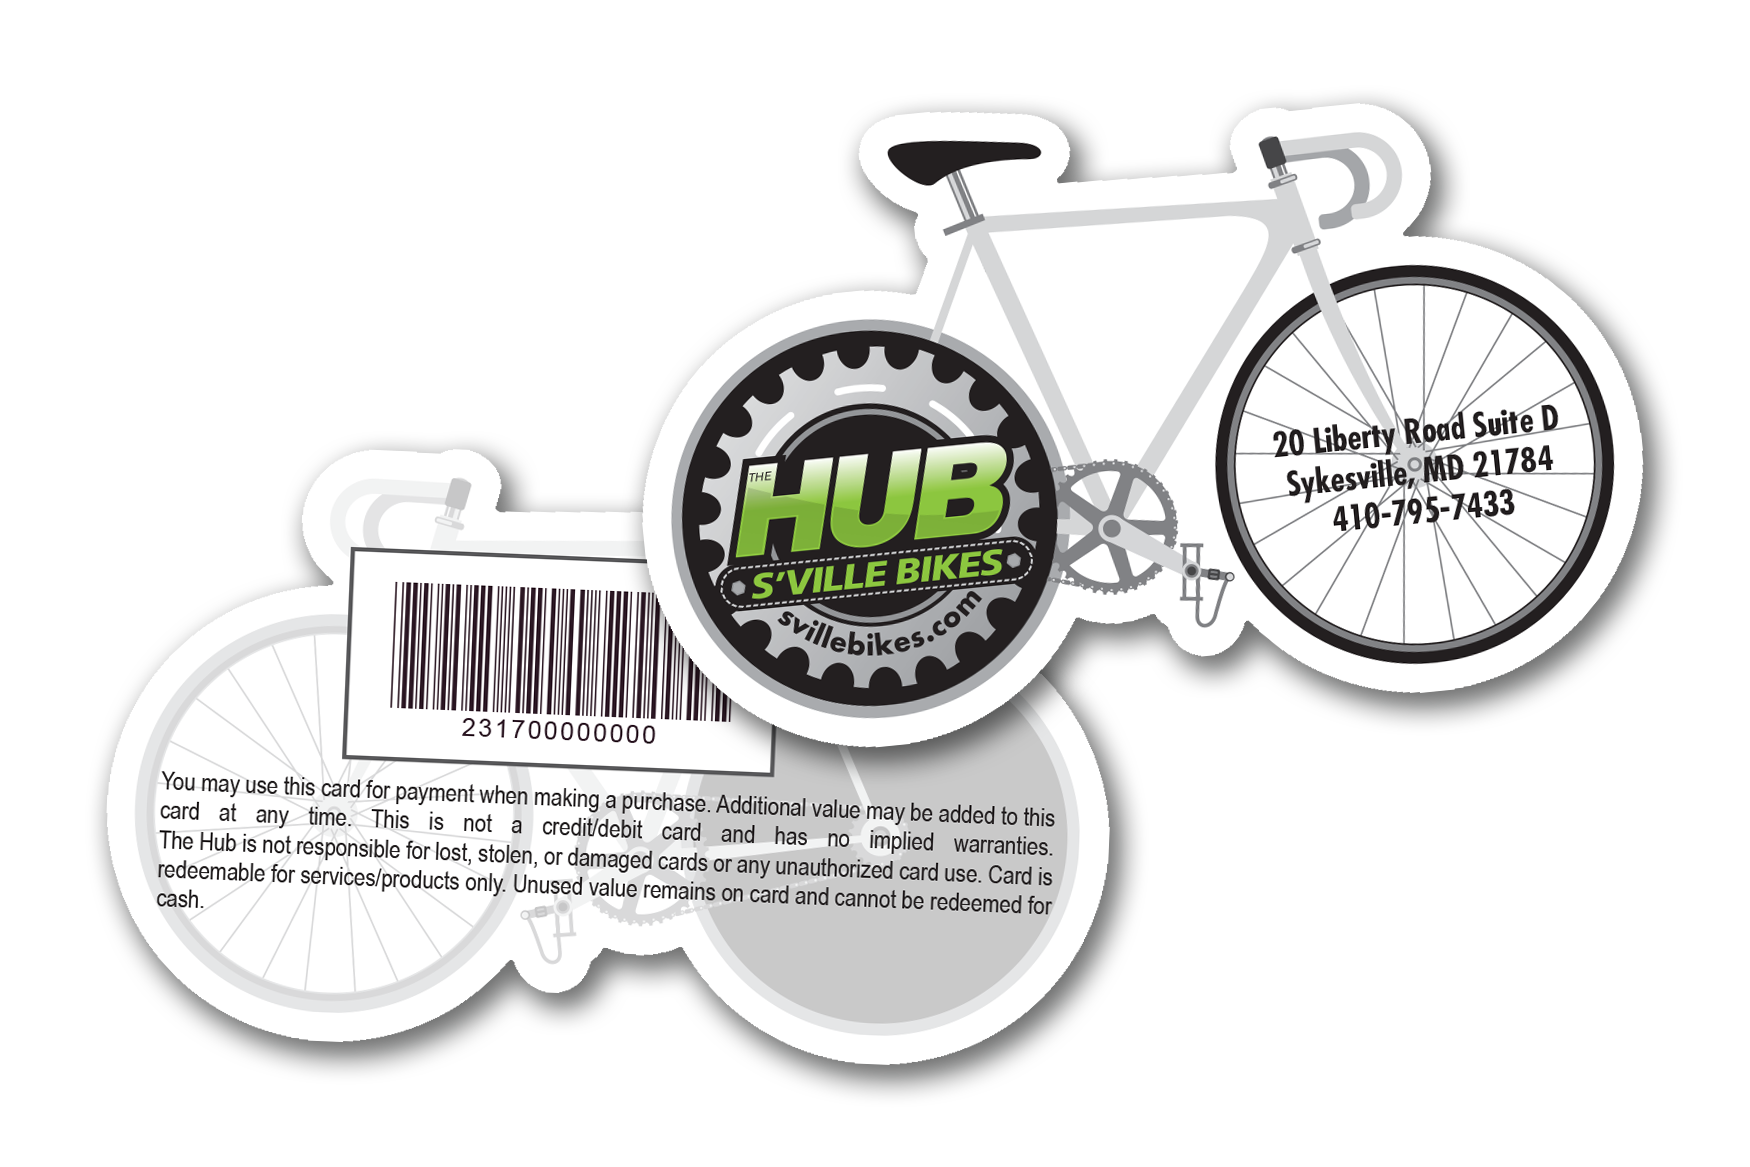 Gift-Card-Barcode-Bike-Shape-SV-Bikes-KT8863-J080821.png